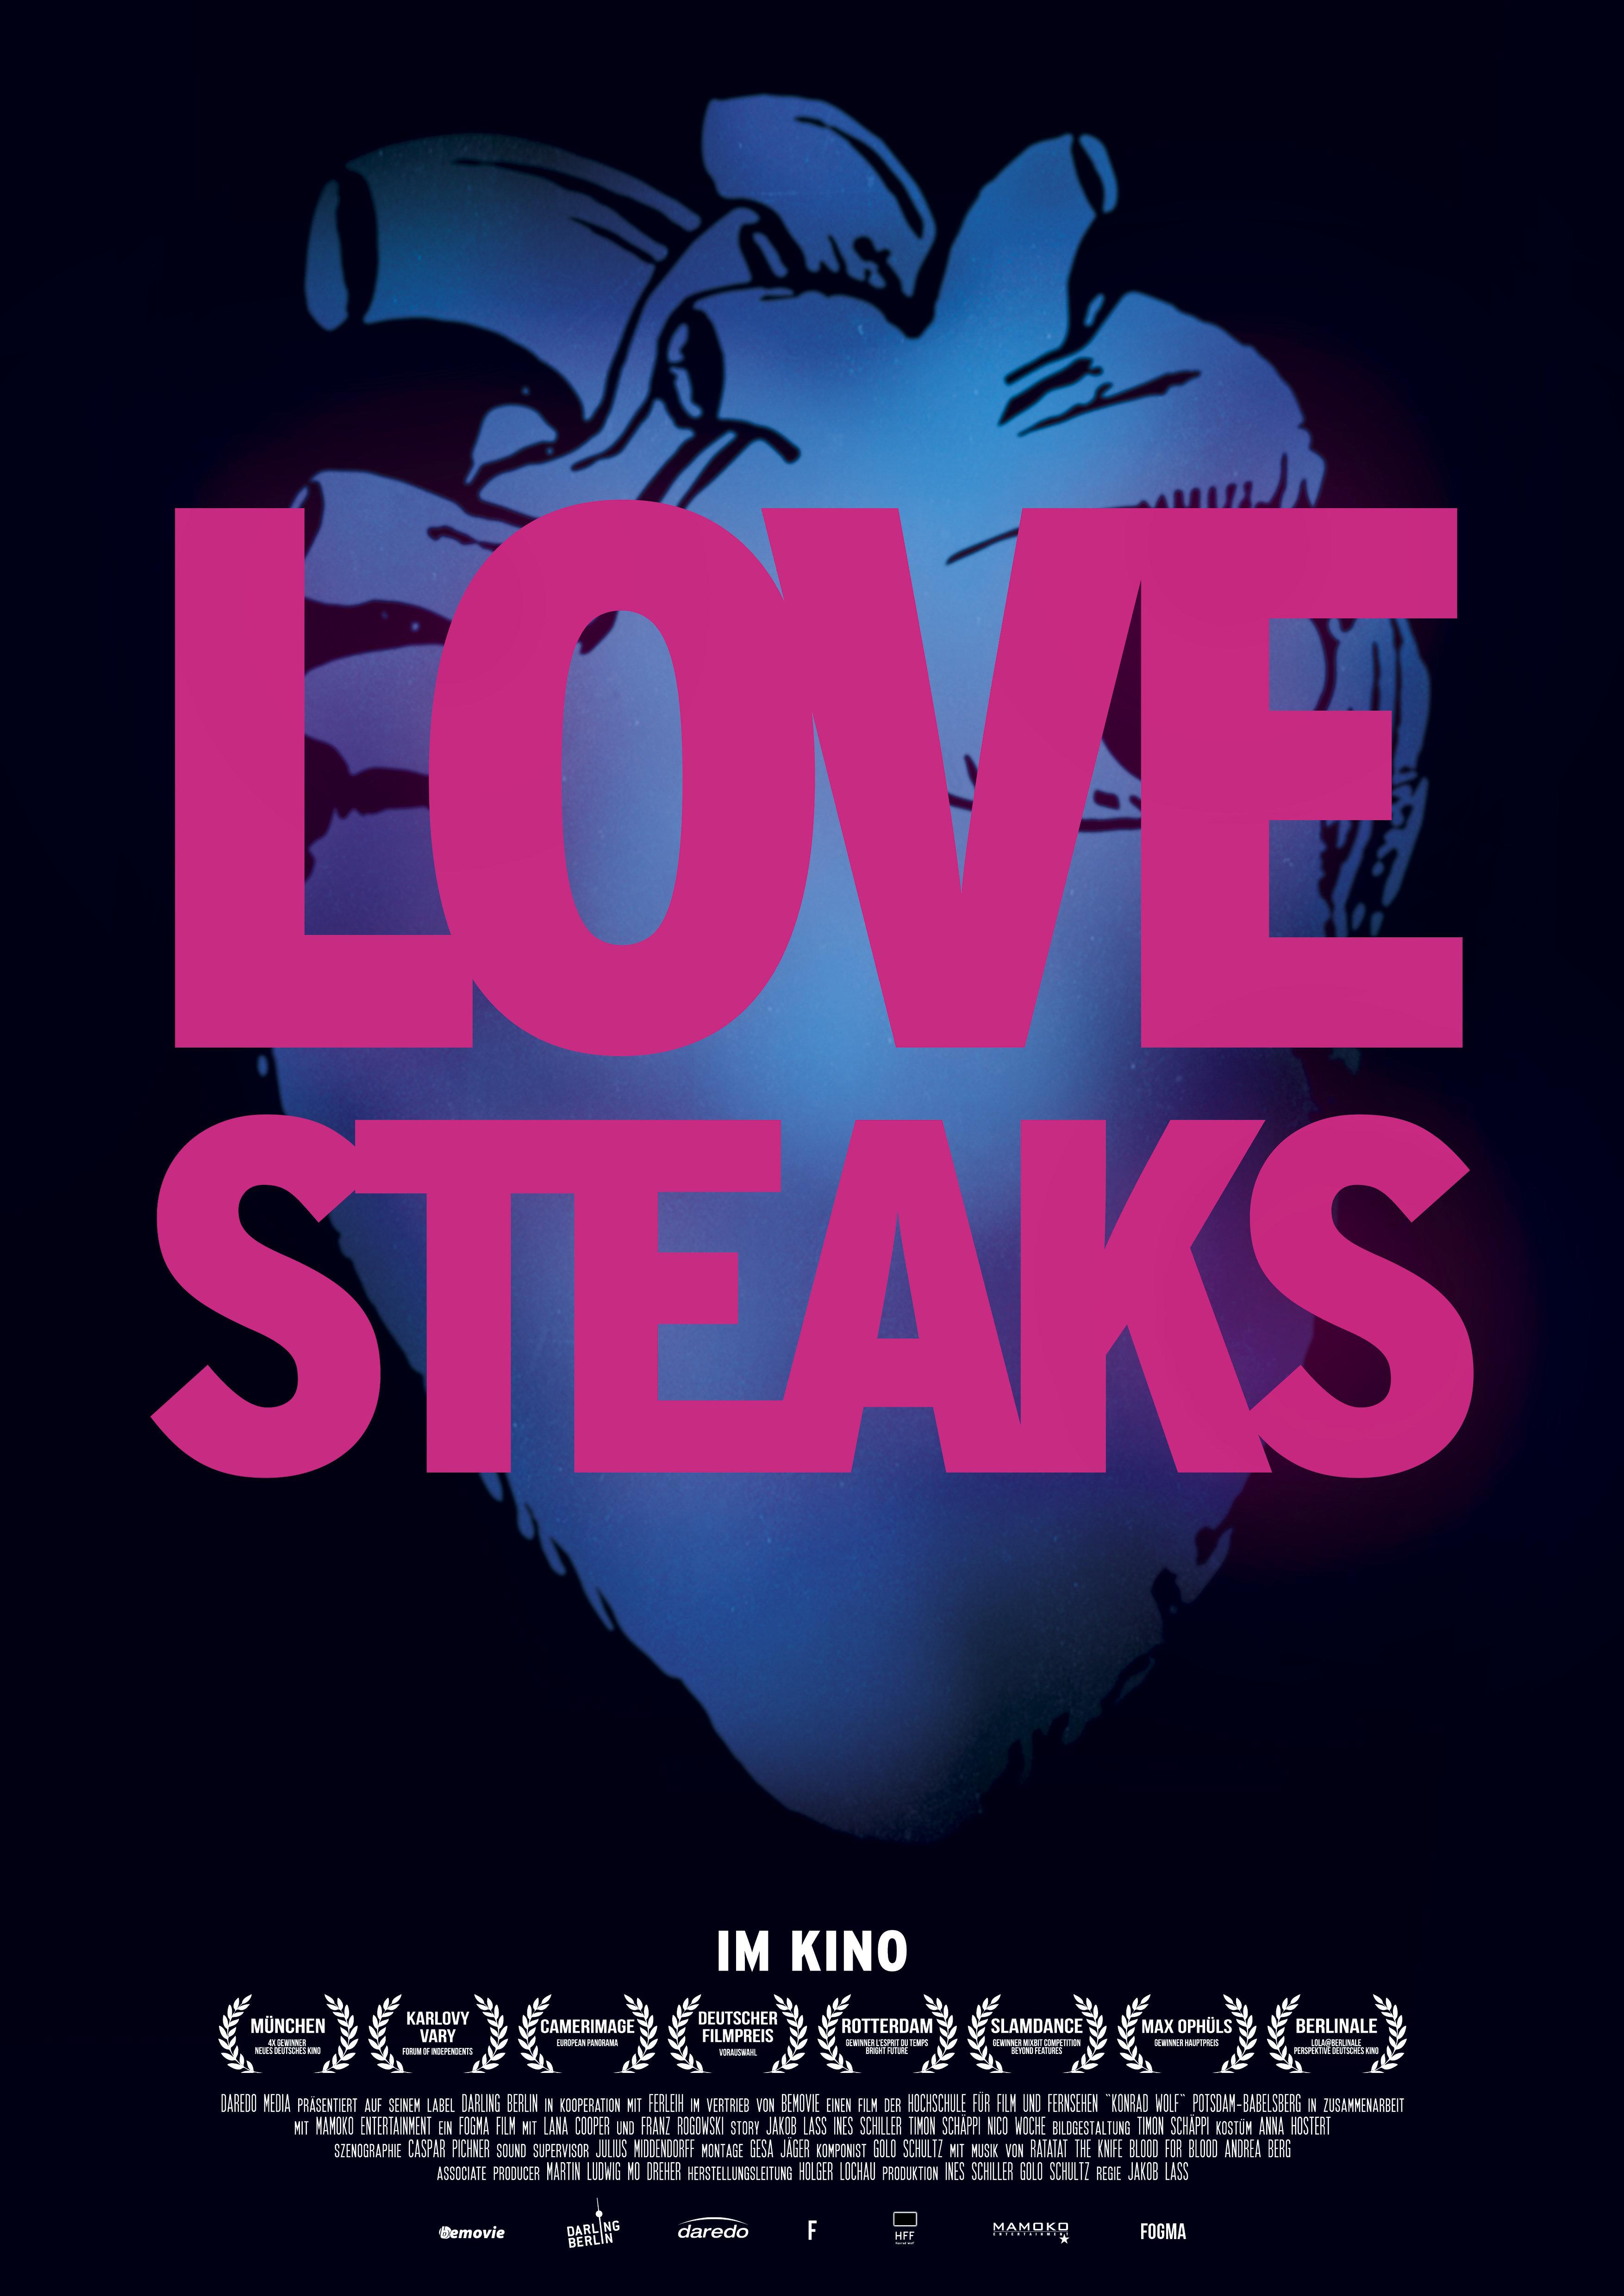 Love Steaks 2013 Imdb